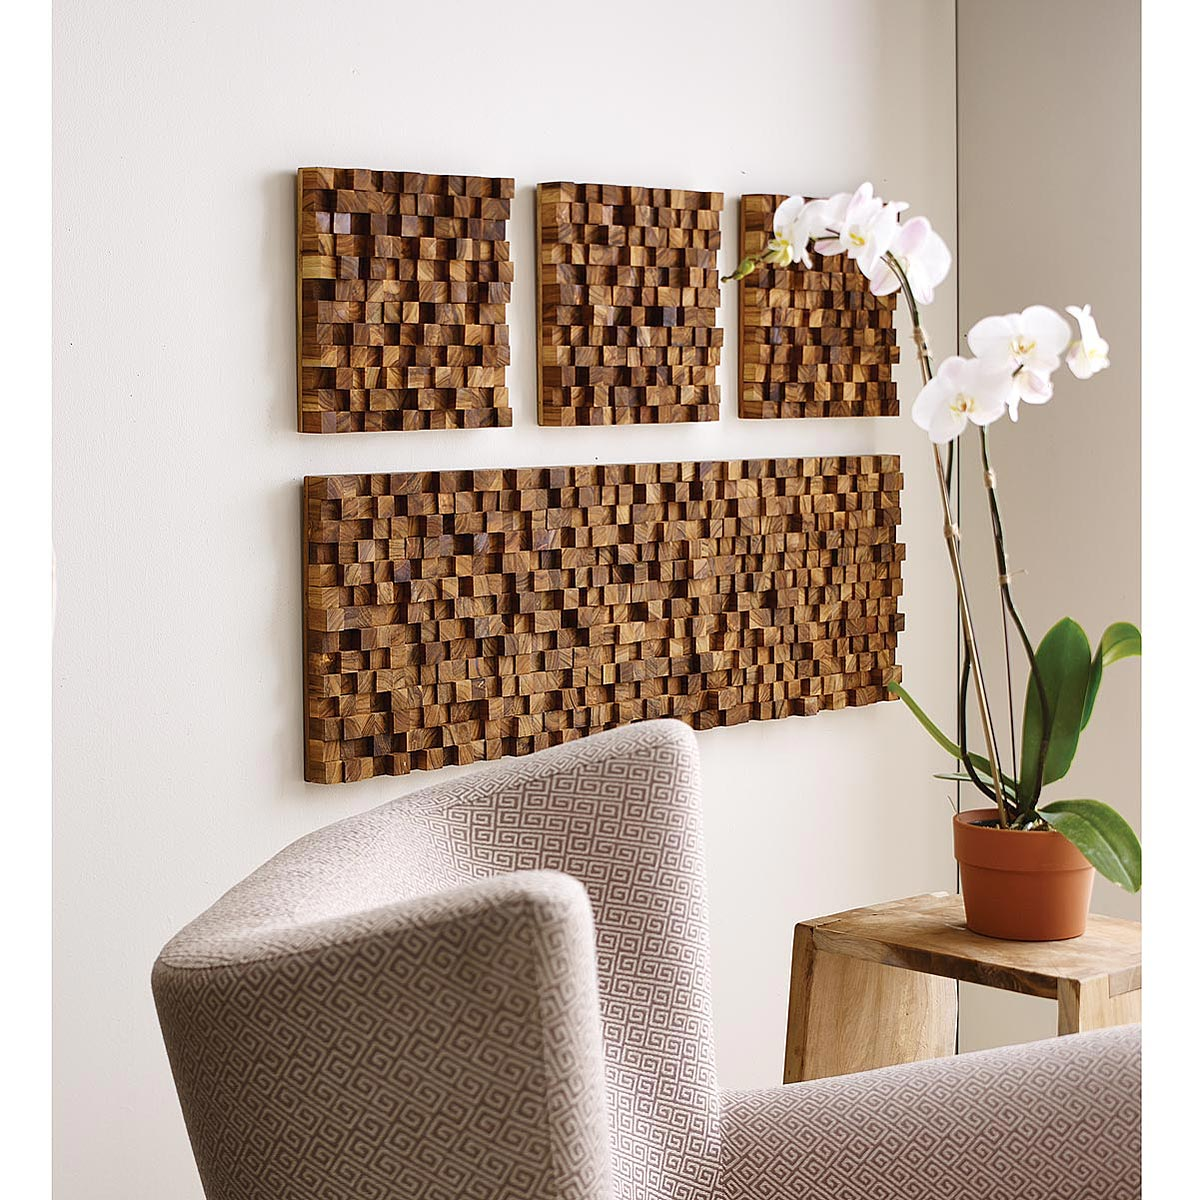 Brand-new Square Takara Wall Art | Teak wood, 3D art | UncommonGoods KE15